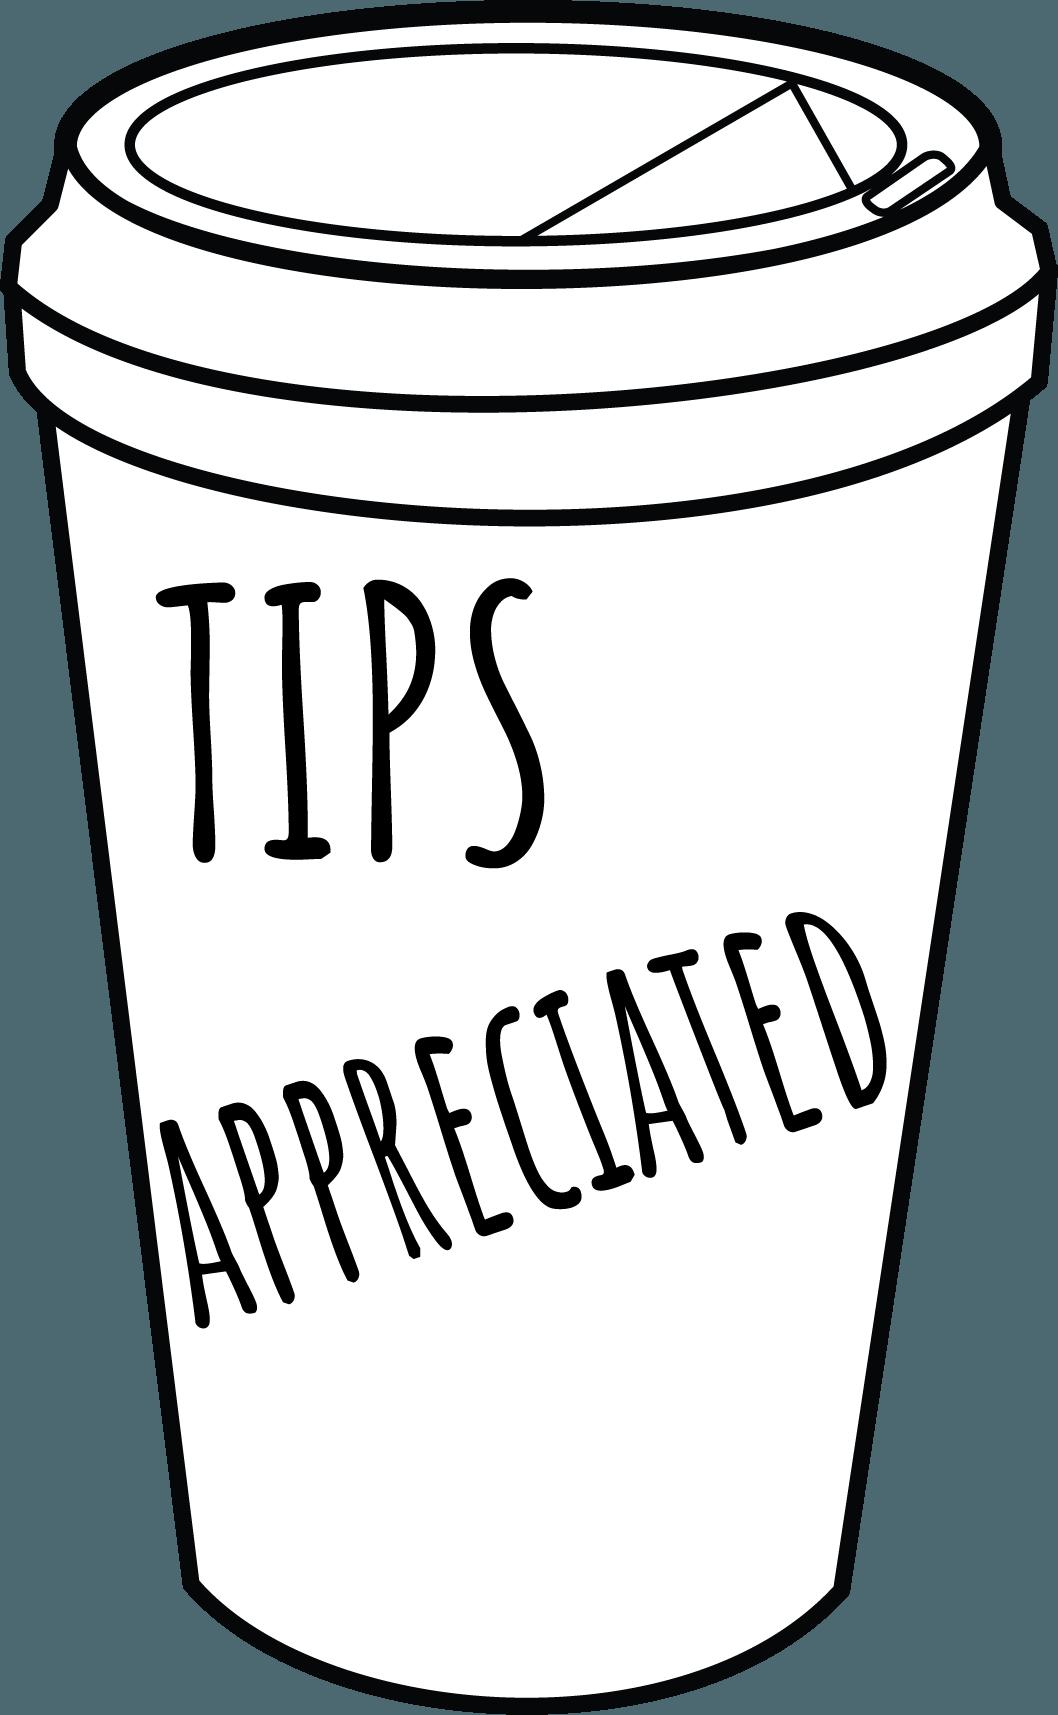 The Tip Jar On Tipping Artists Play On Words Design Word Design Tip Jars Words